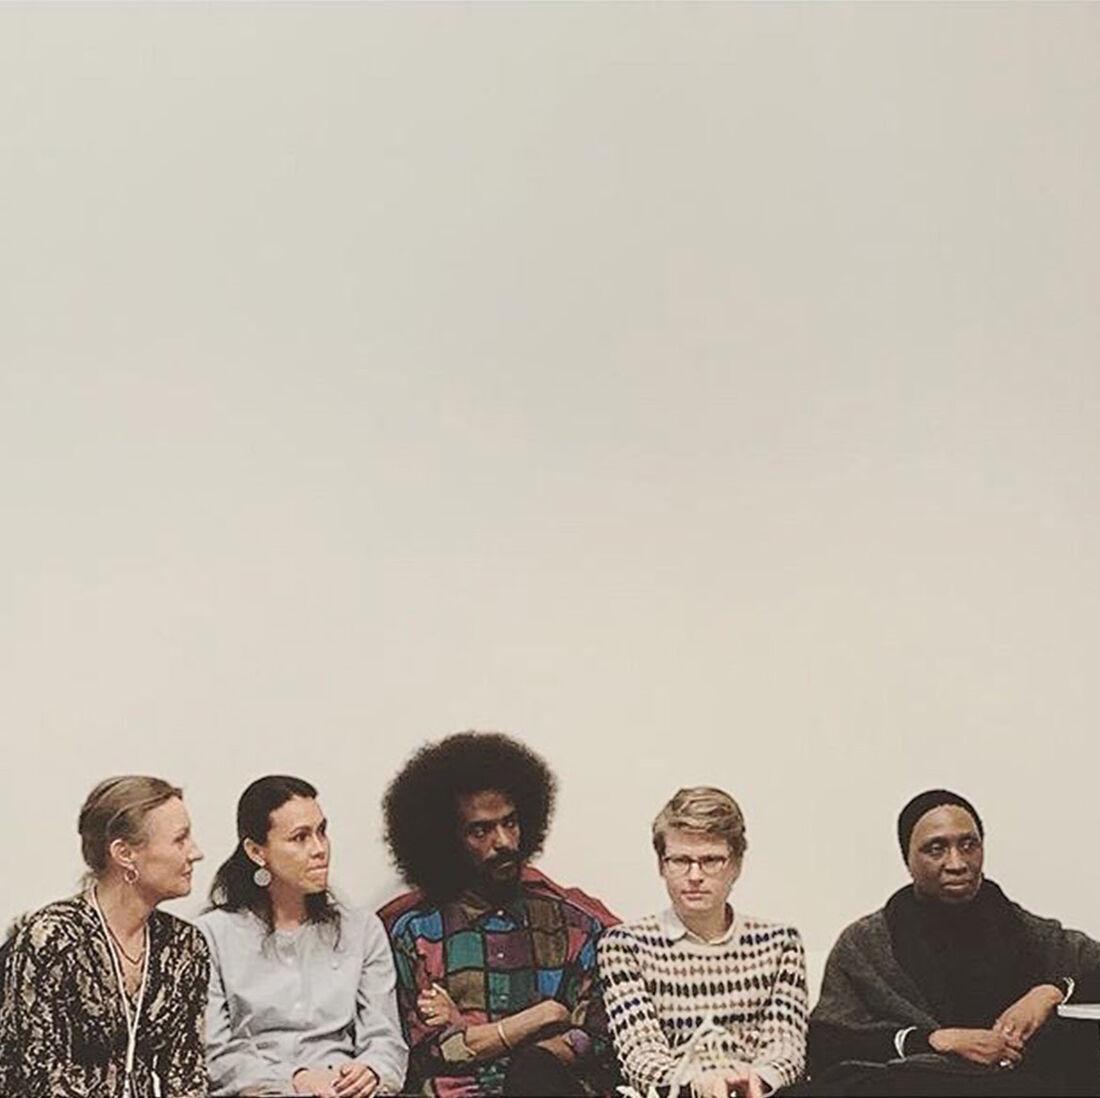 Eva-Lotta Flach (Galleri Flach), Macarena Olmus Dusant (art historian & independentwriter), Samuel Girma (Konsthall C), Theodor Ringborg (Bonniers Konsthall) and Karen Alexander (curator) on diversity in the art world. Photo: Corina Wahlin